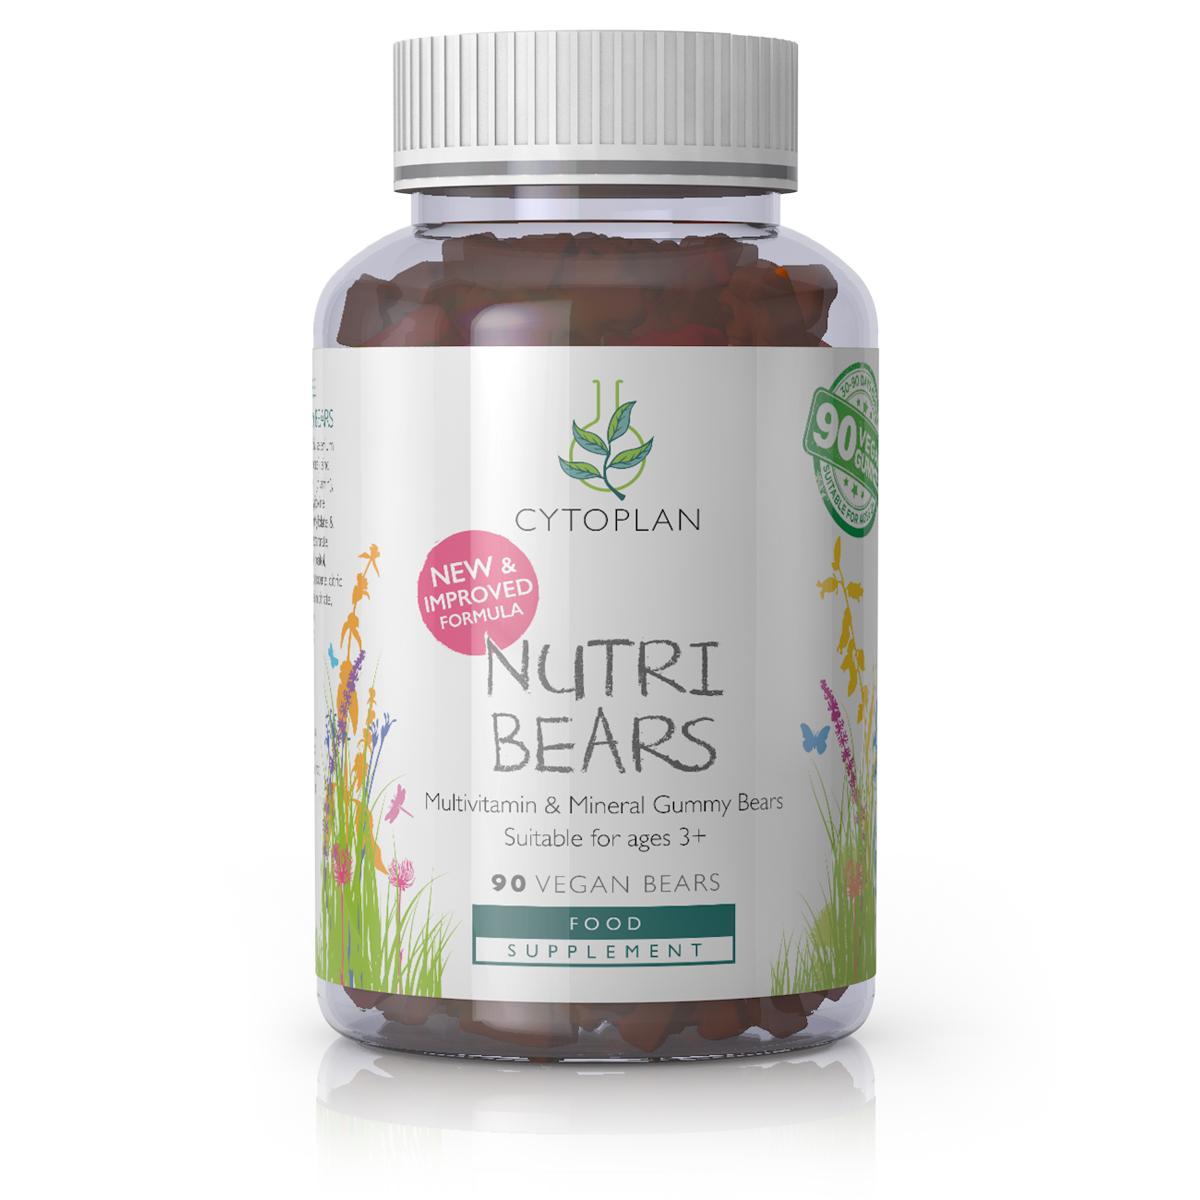 Nutri Bears 90's